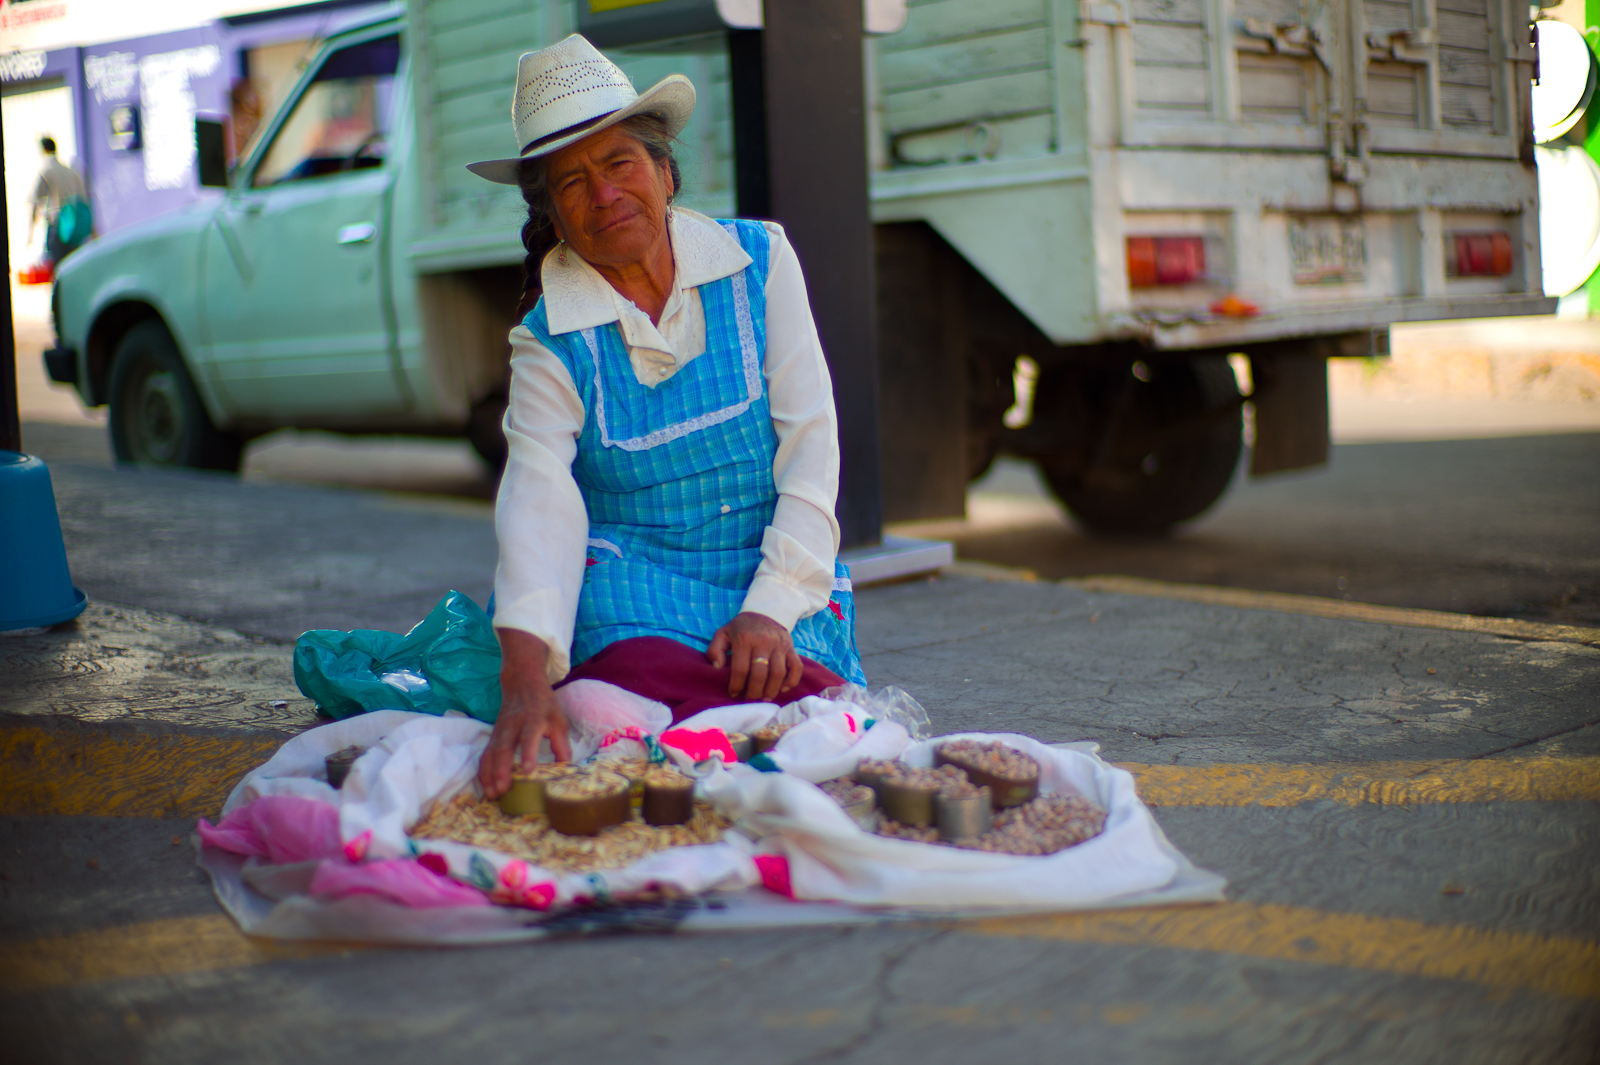 La vendedora de pepitas (pumpkin seed vendor)